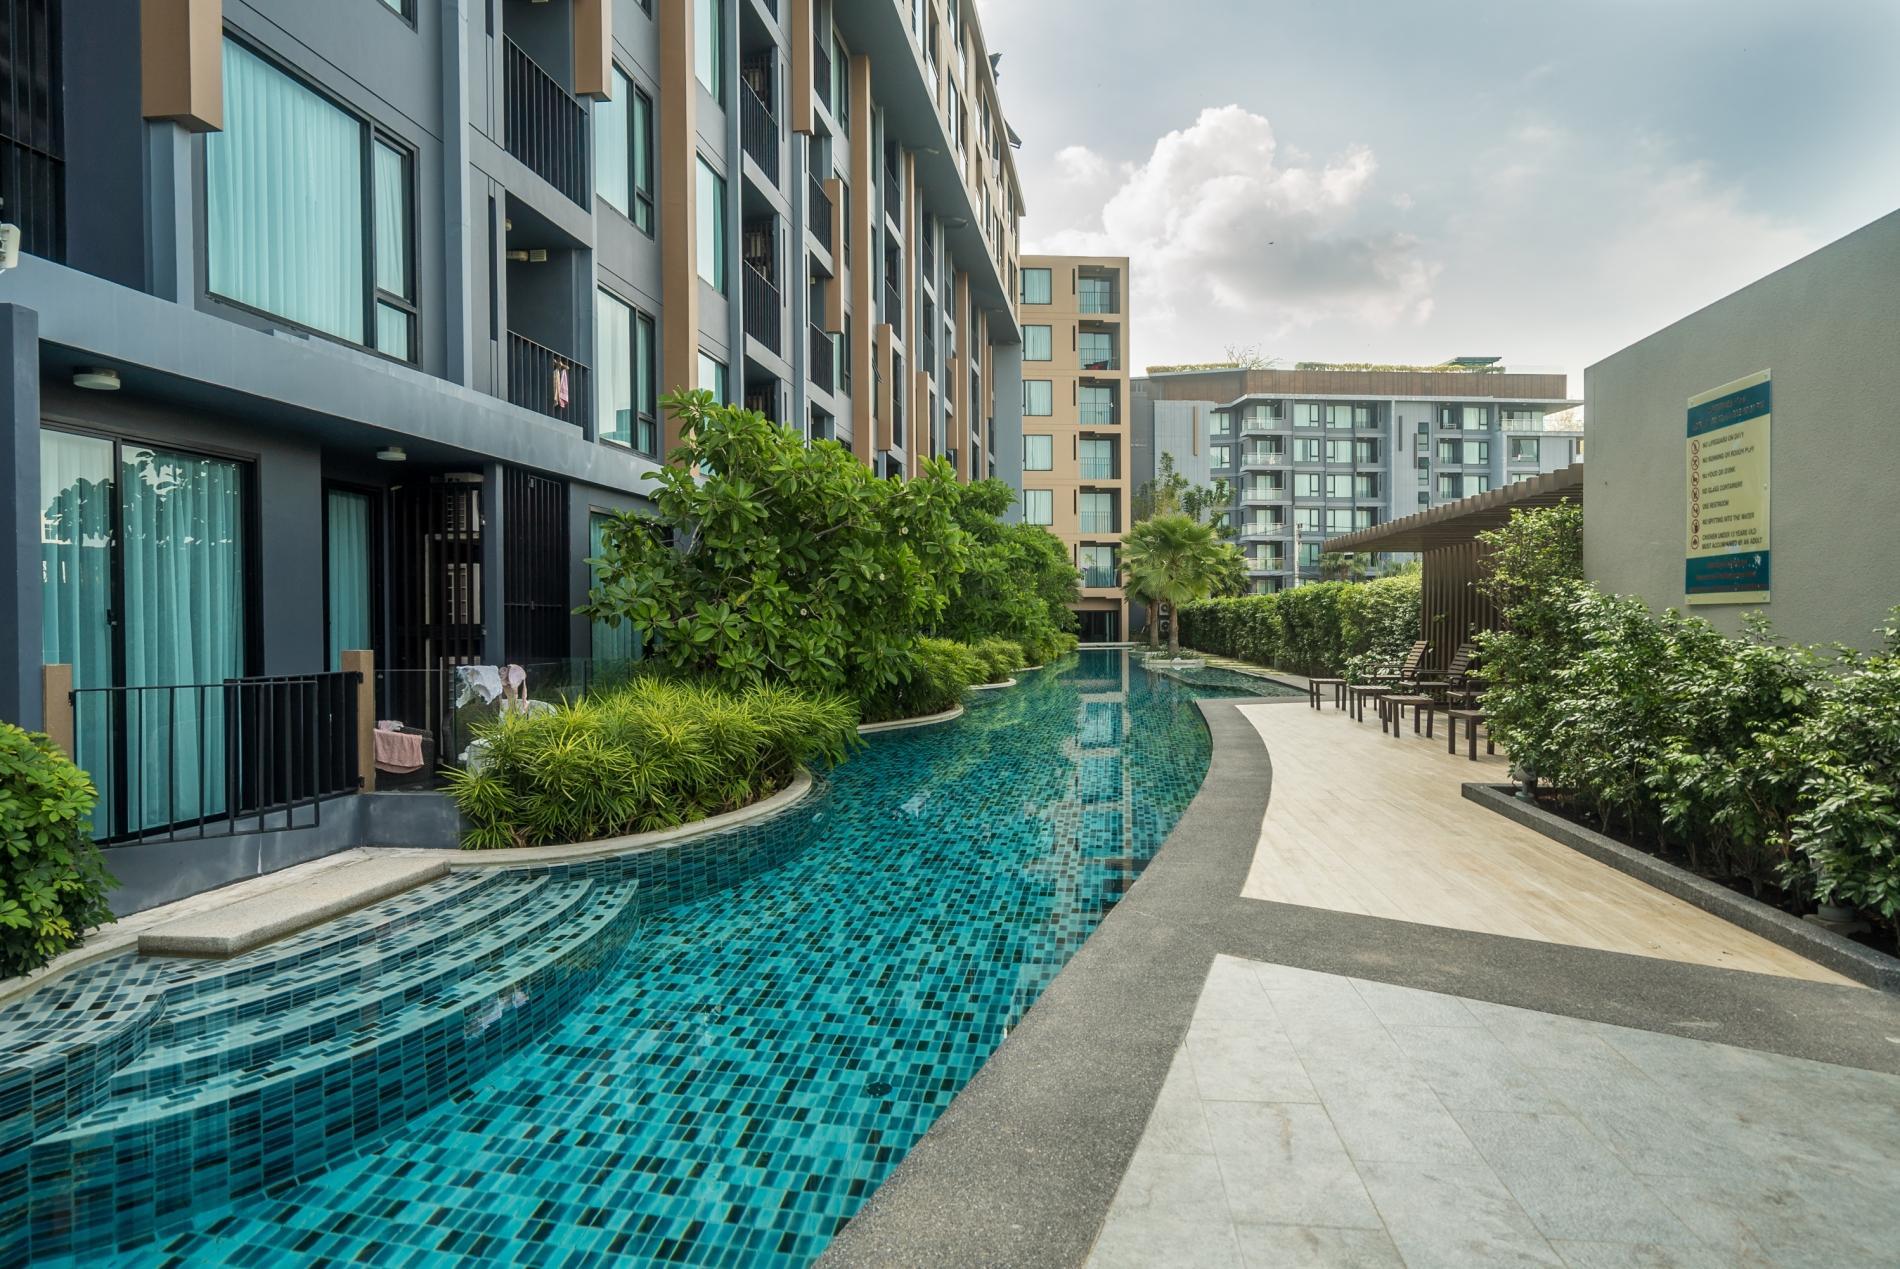 Apartment Aristo 521 - Brand new studio close to beach  3 pools  photo 16834658